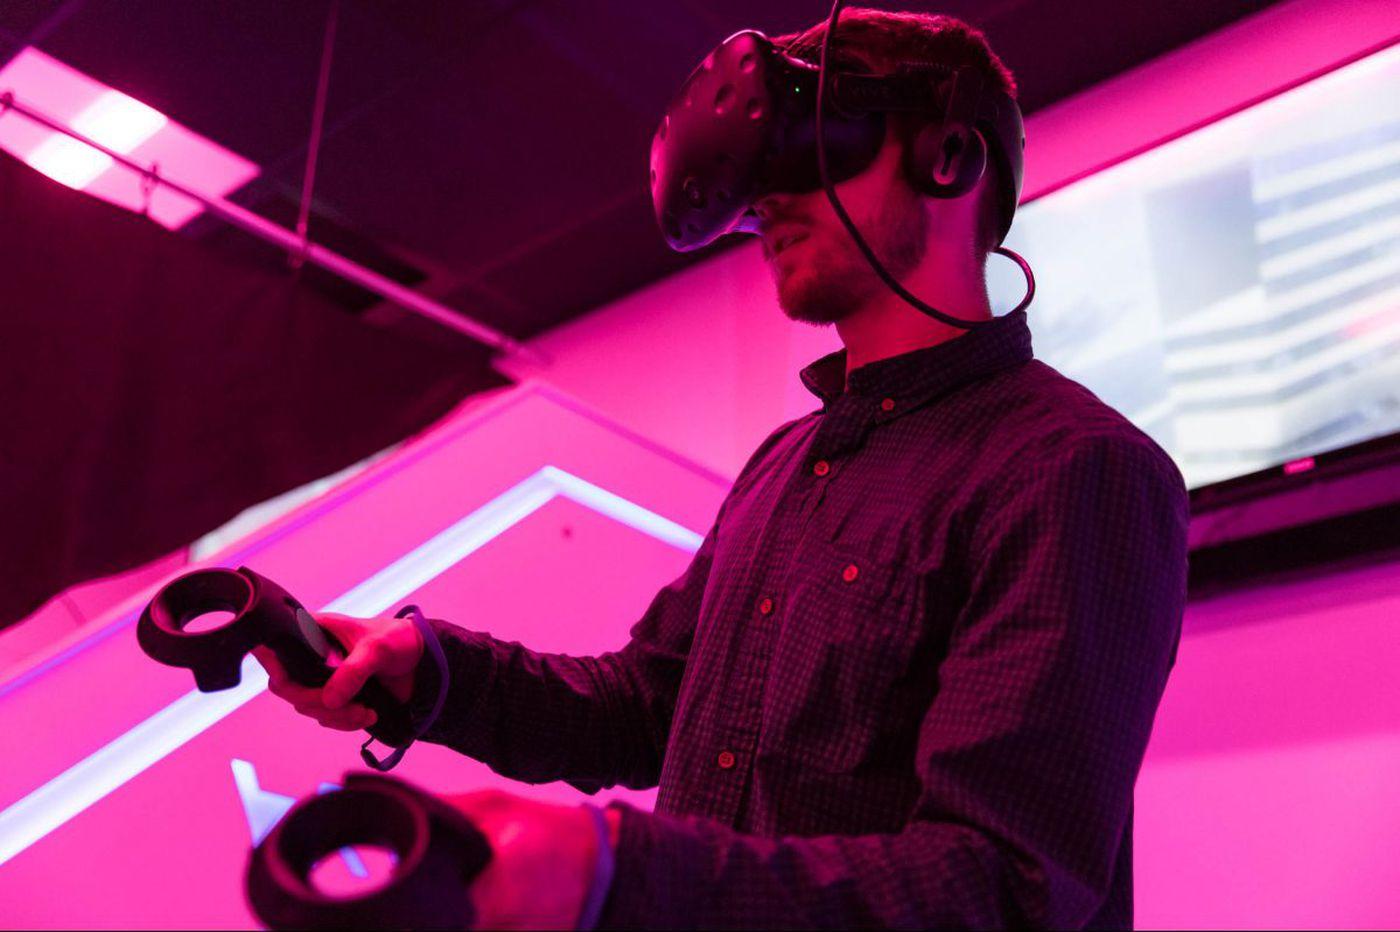 Liberty's virtual reality arcade in Glassboro will let you feel like Iron Man